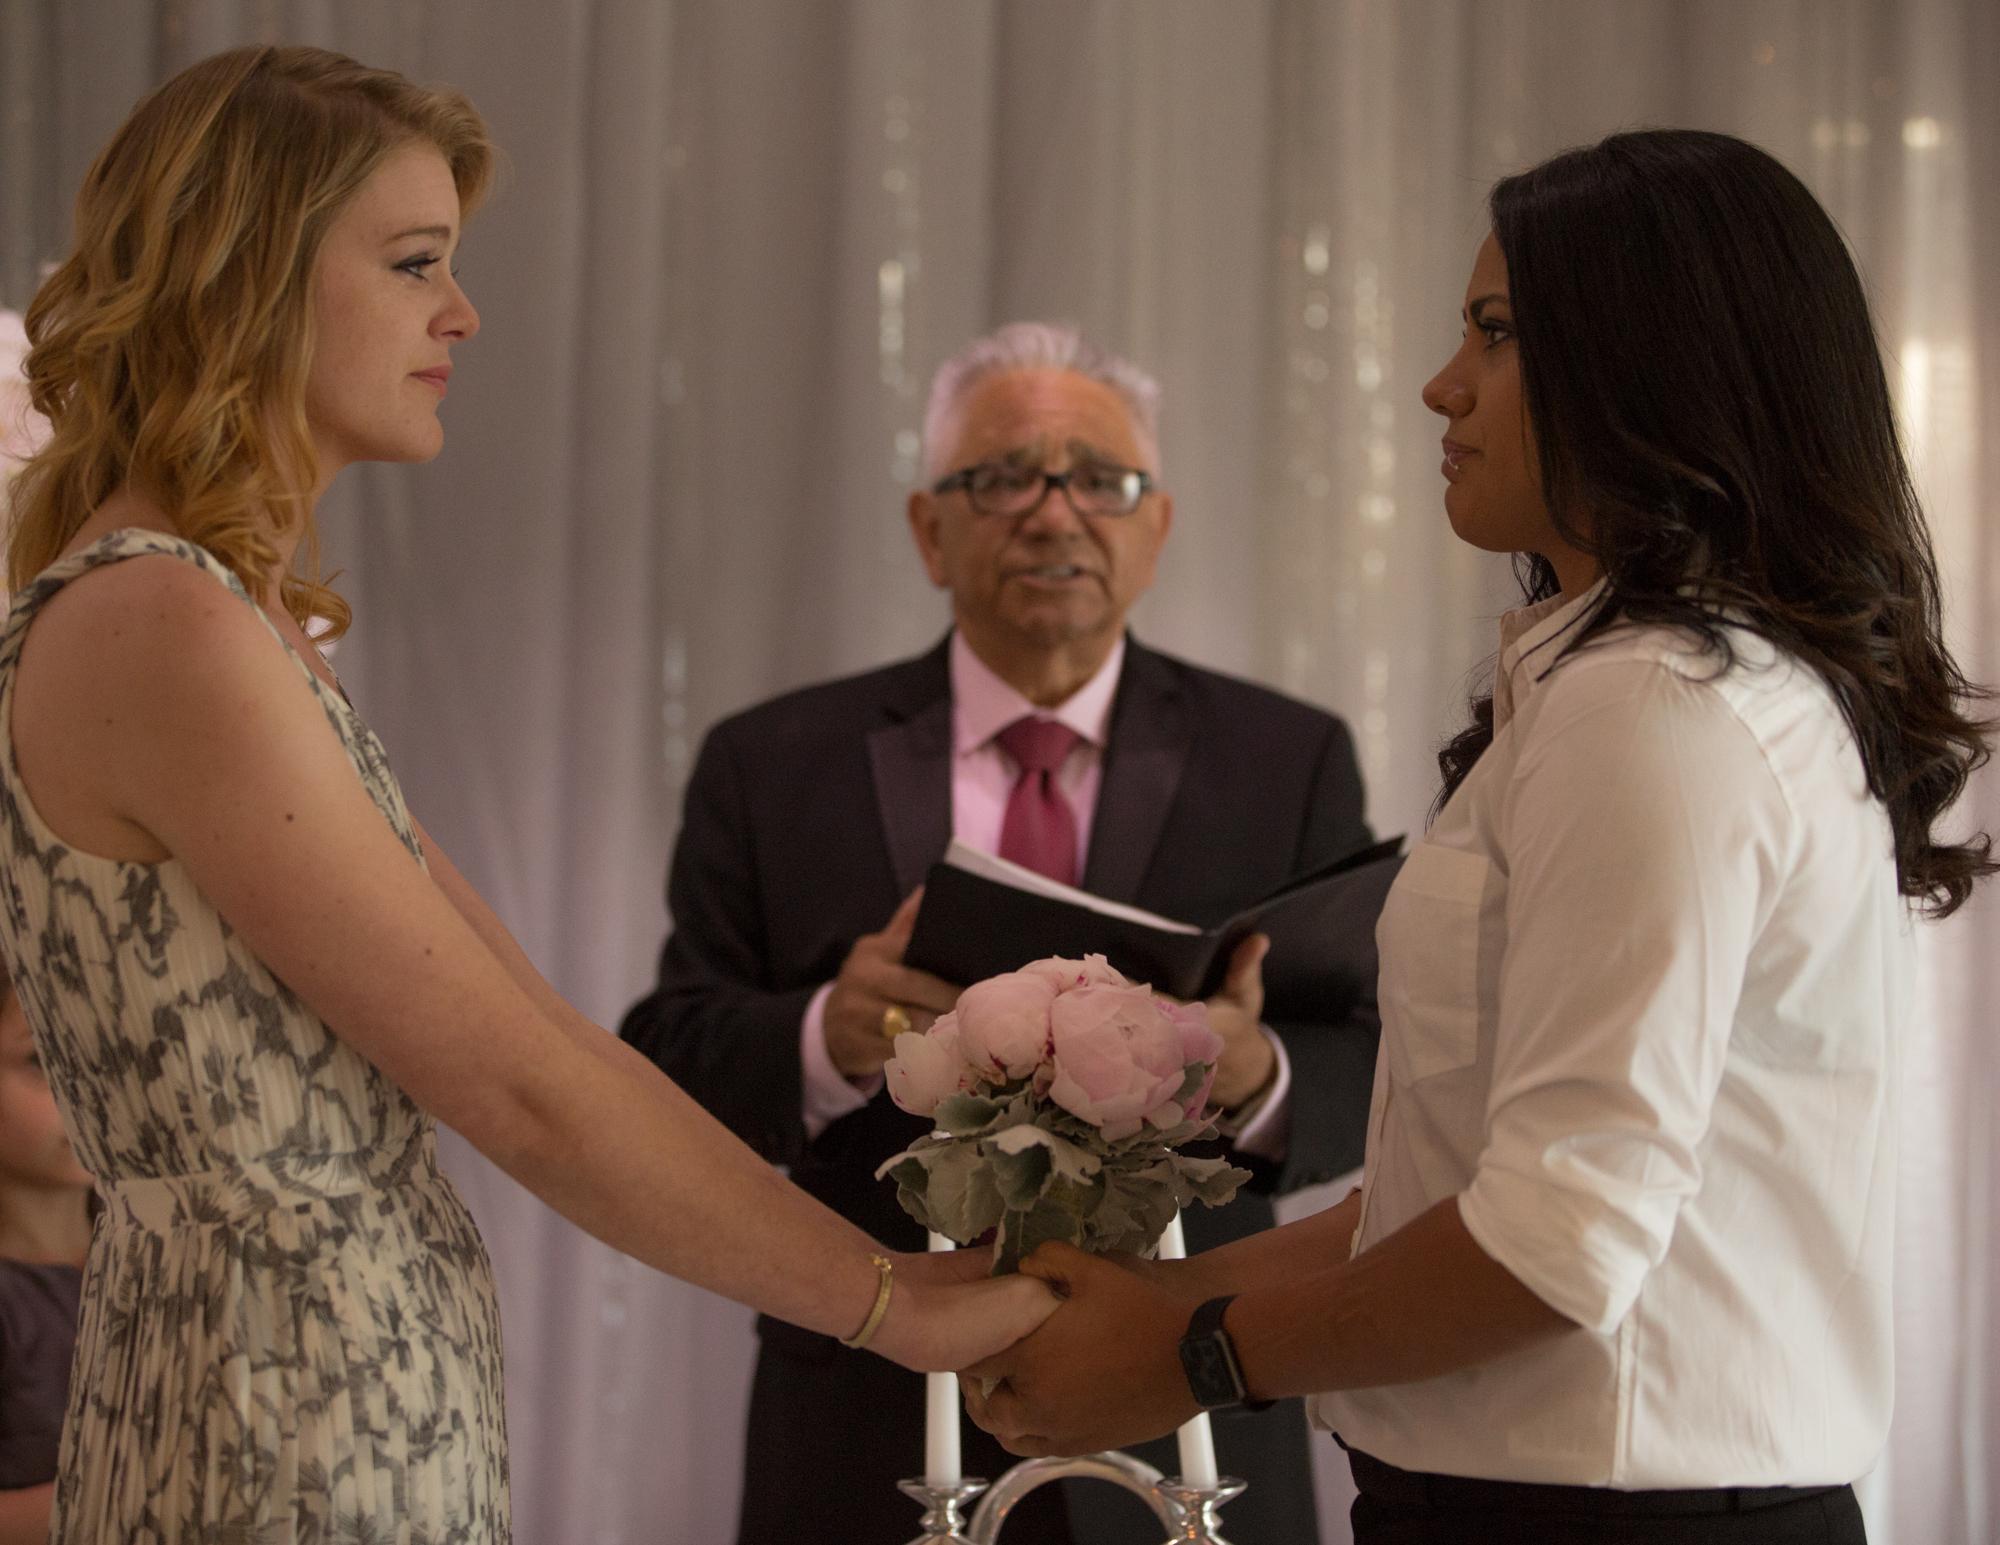 Colleen Stavrakos Wedding Photography brides at altar